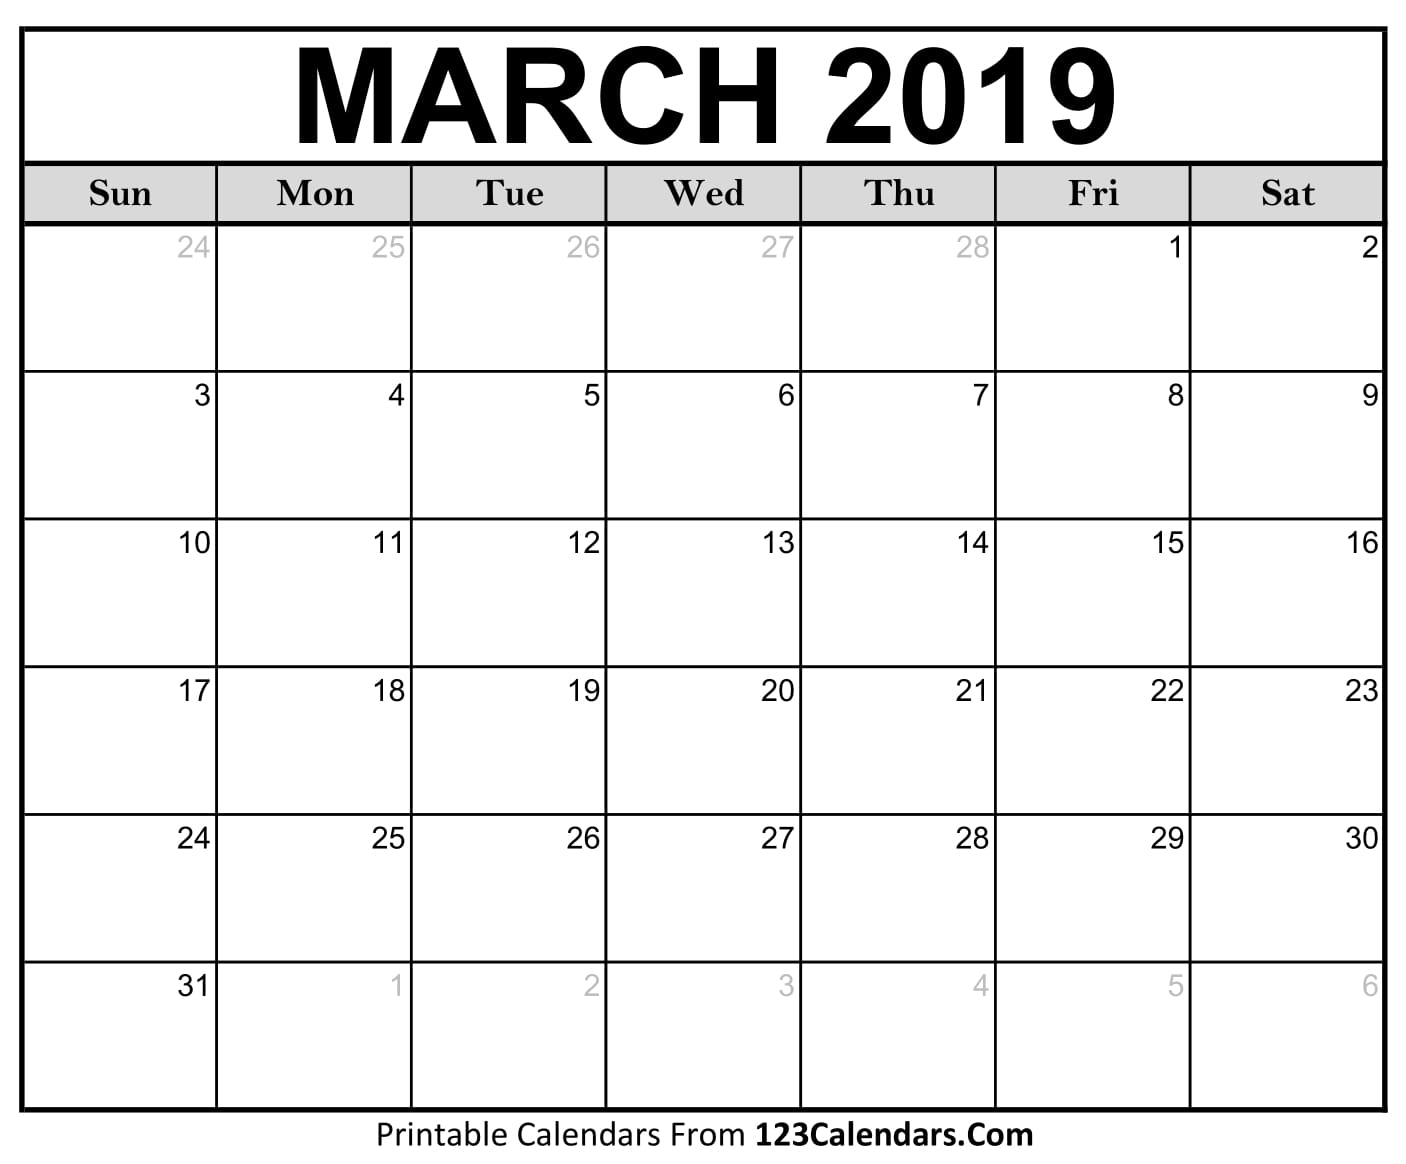 Calendar Monthly March : March month calendar turkeyprivate tk